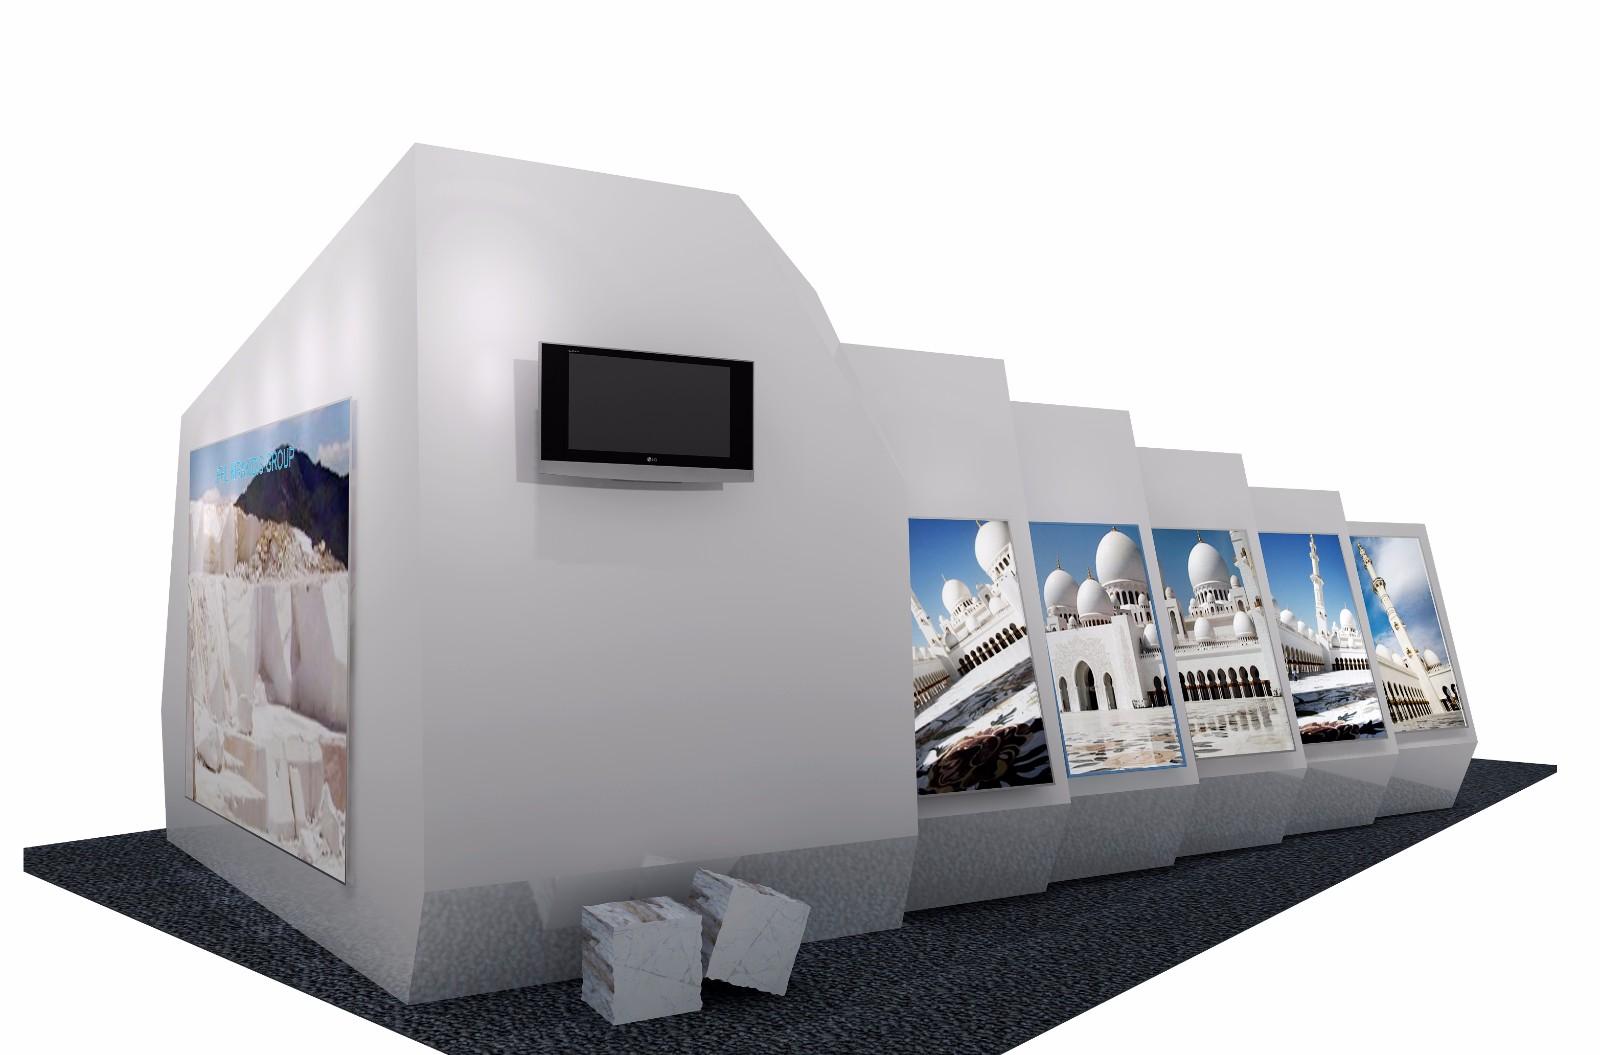 fhl|展览特装-厦门市嘉维世纪会展服务有限公司